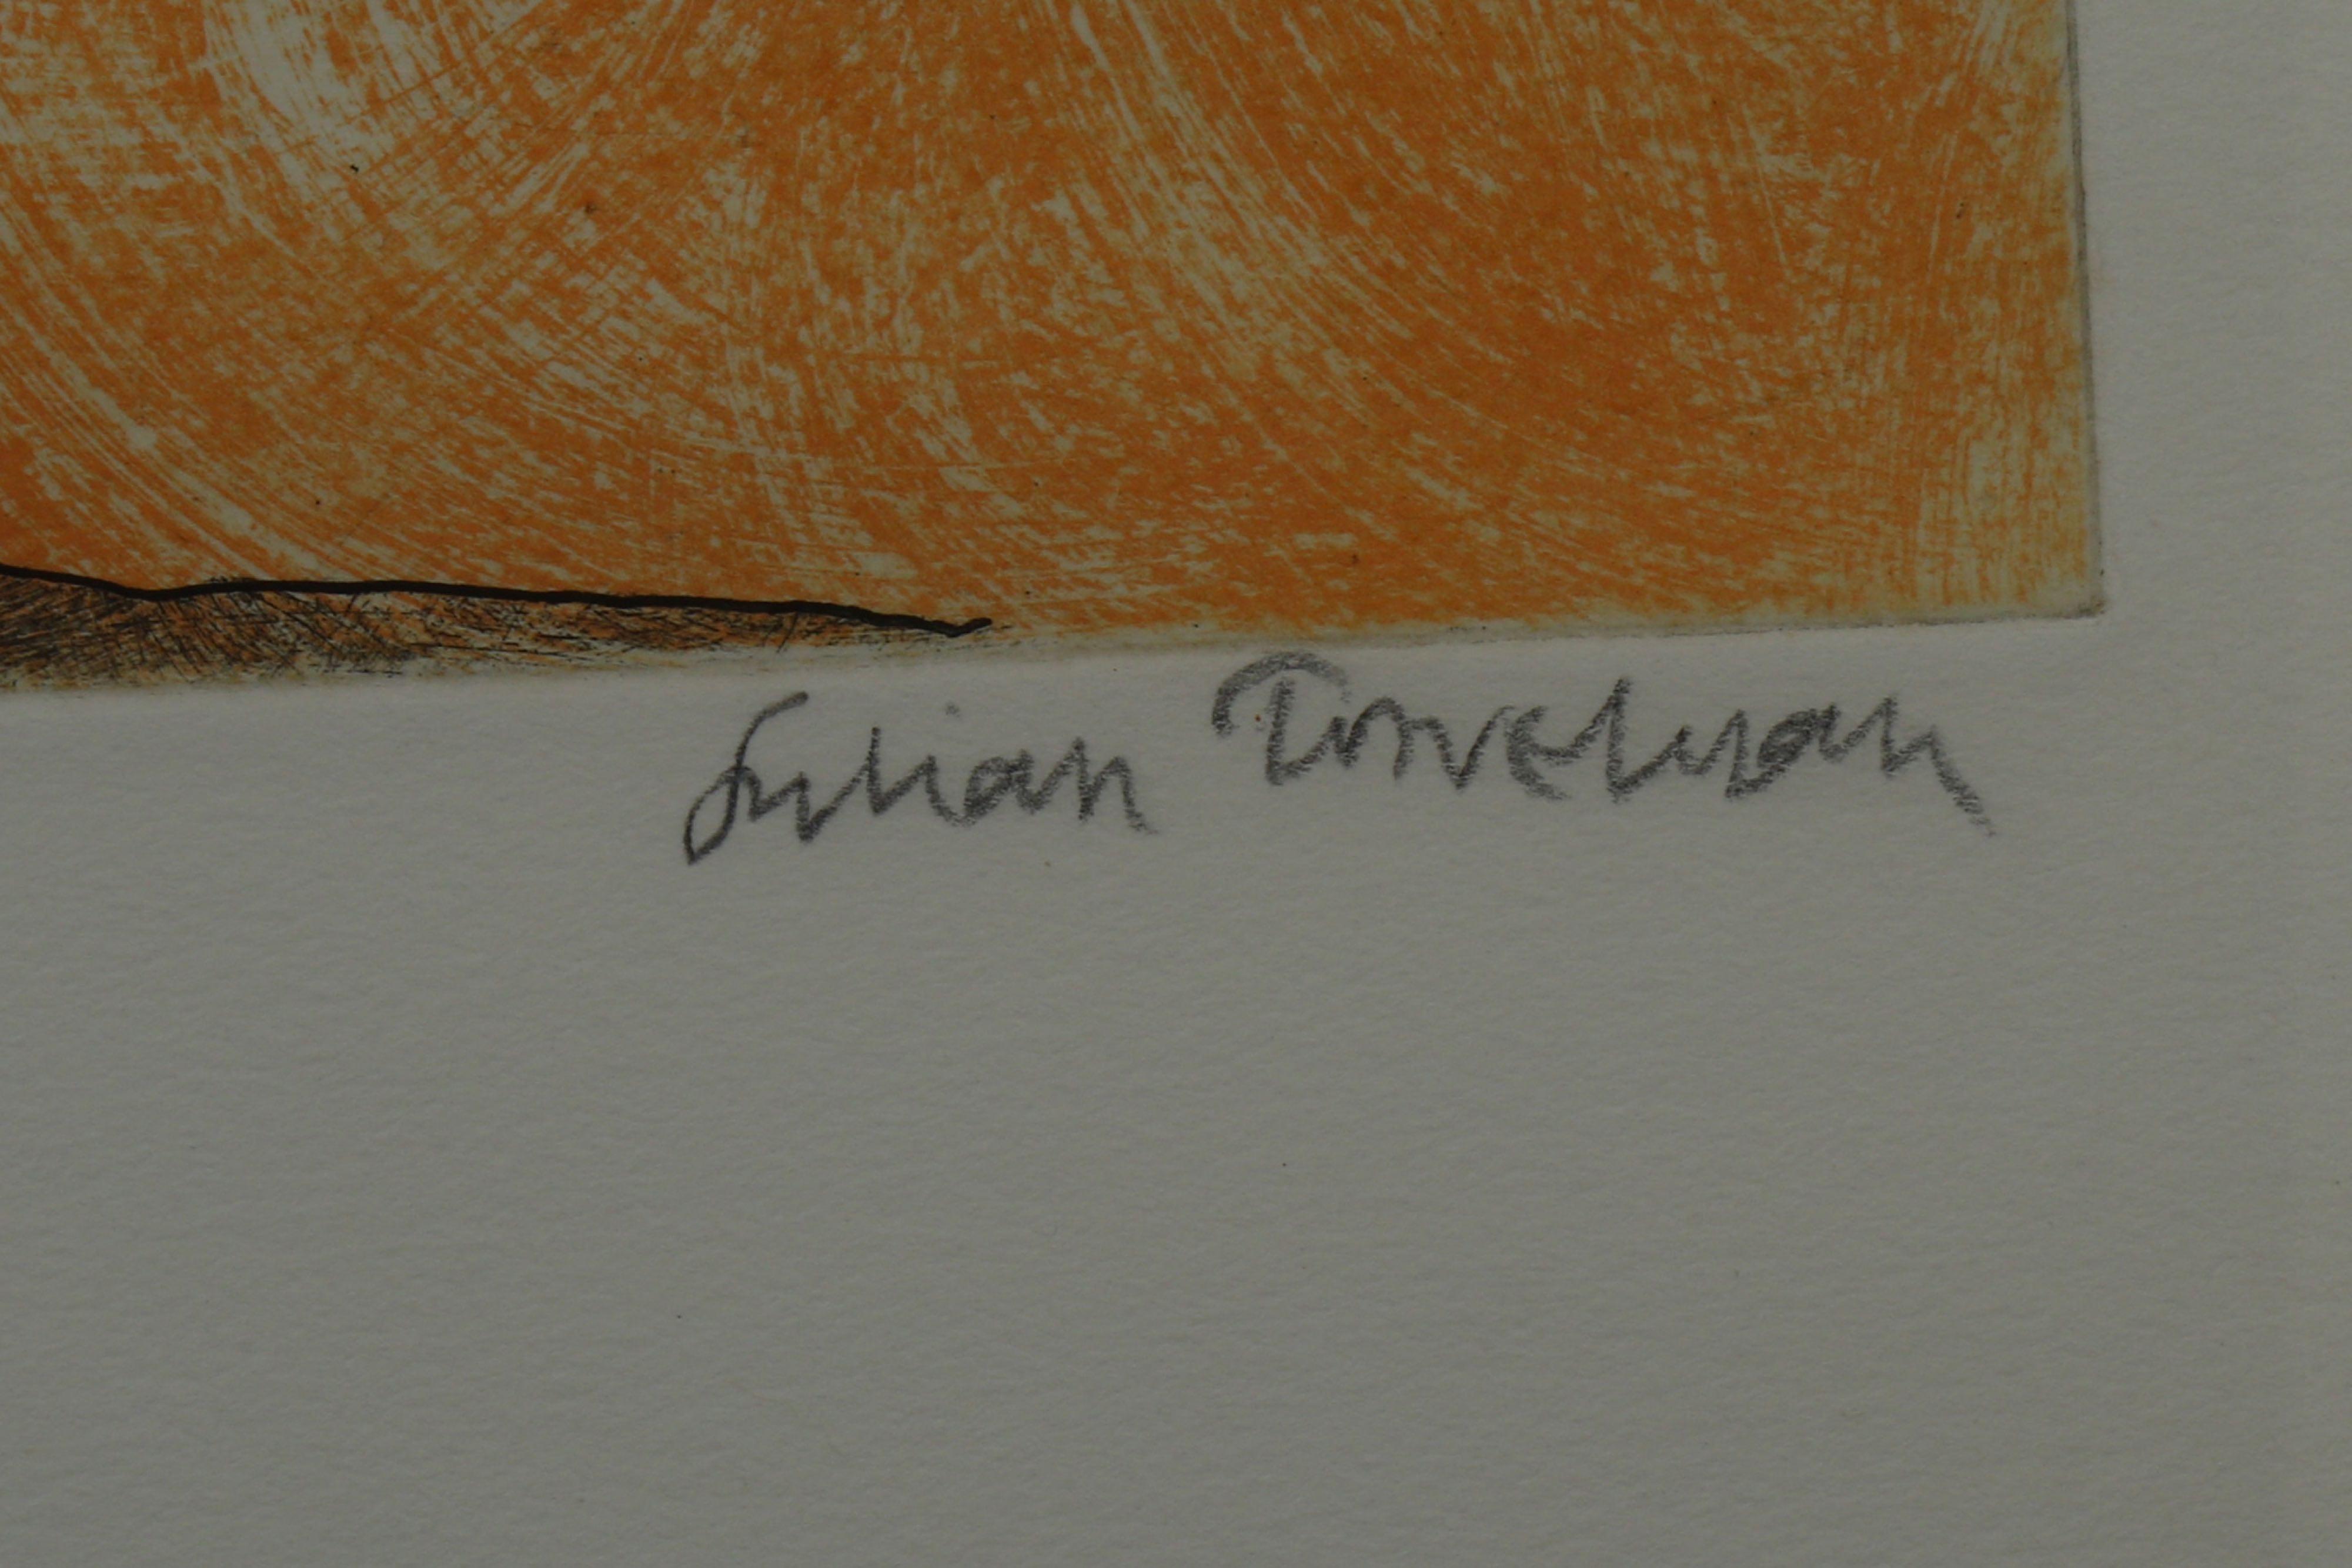 JULIAN TREVELYAN, R.A. (1910-1988) - Image 3 of 7